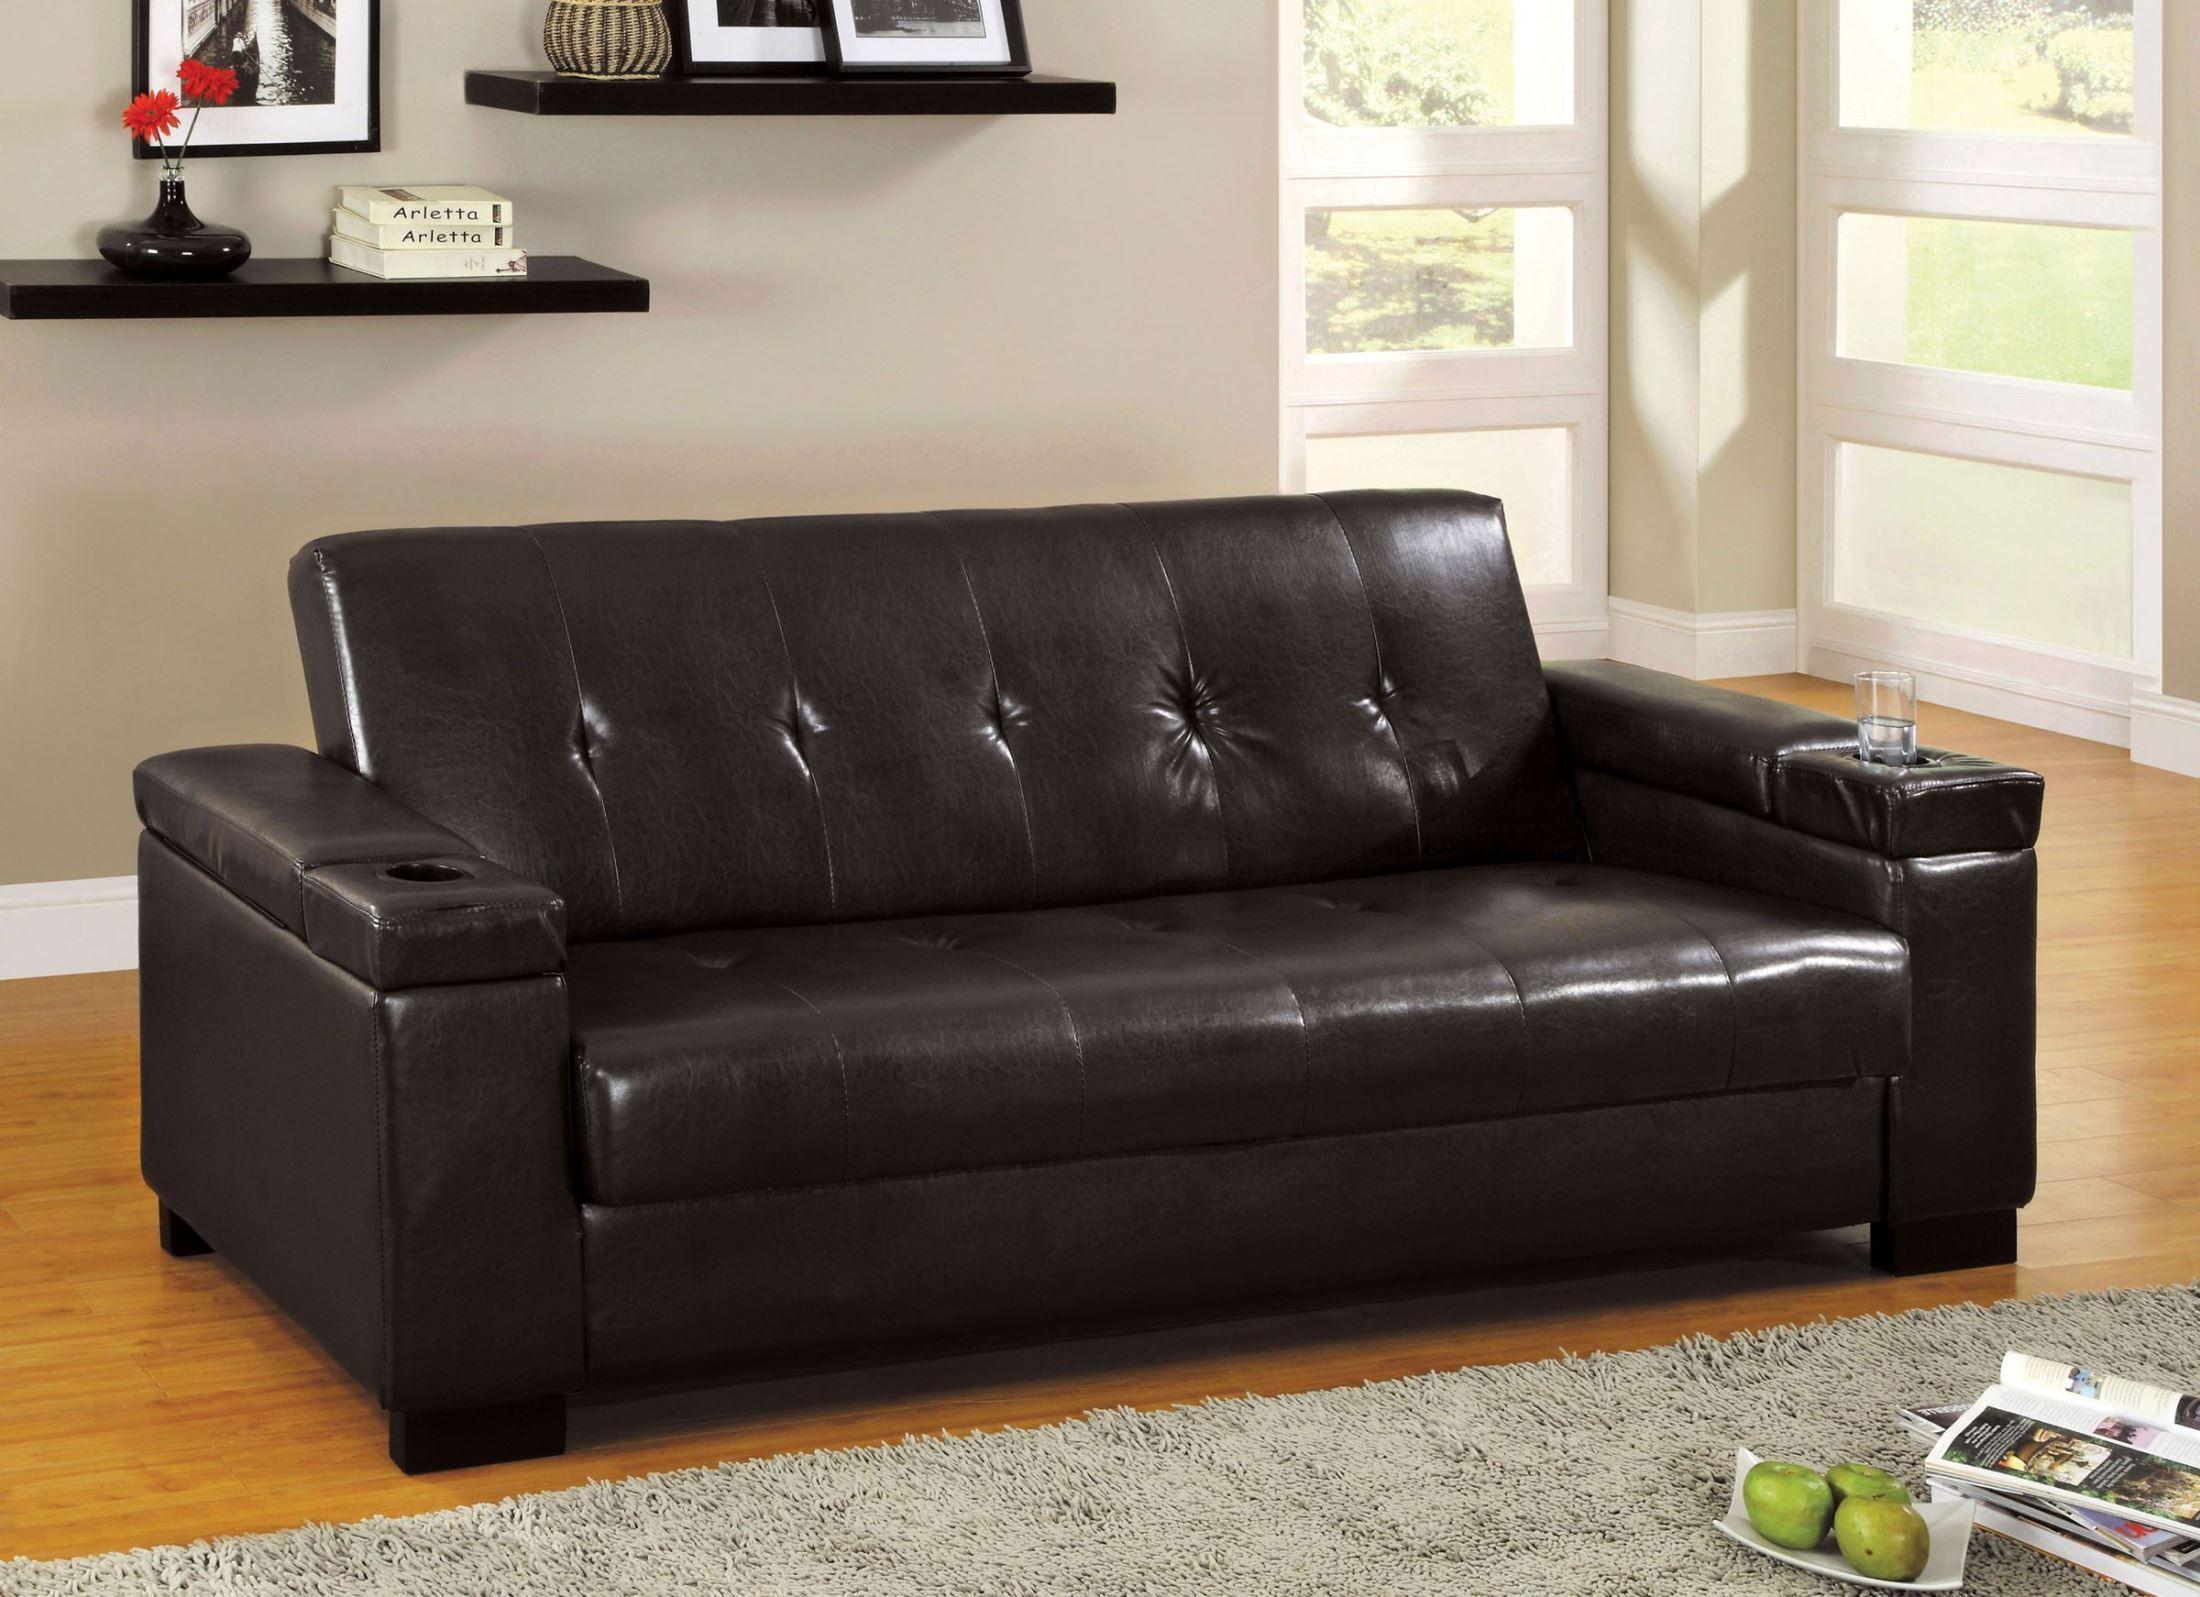 Logan Leatherette Futon Storage Sofa From Furniture Of In Hartford Storage Sectional Futon Sofas (View 3 of 15)